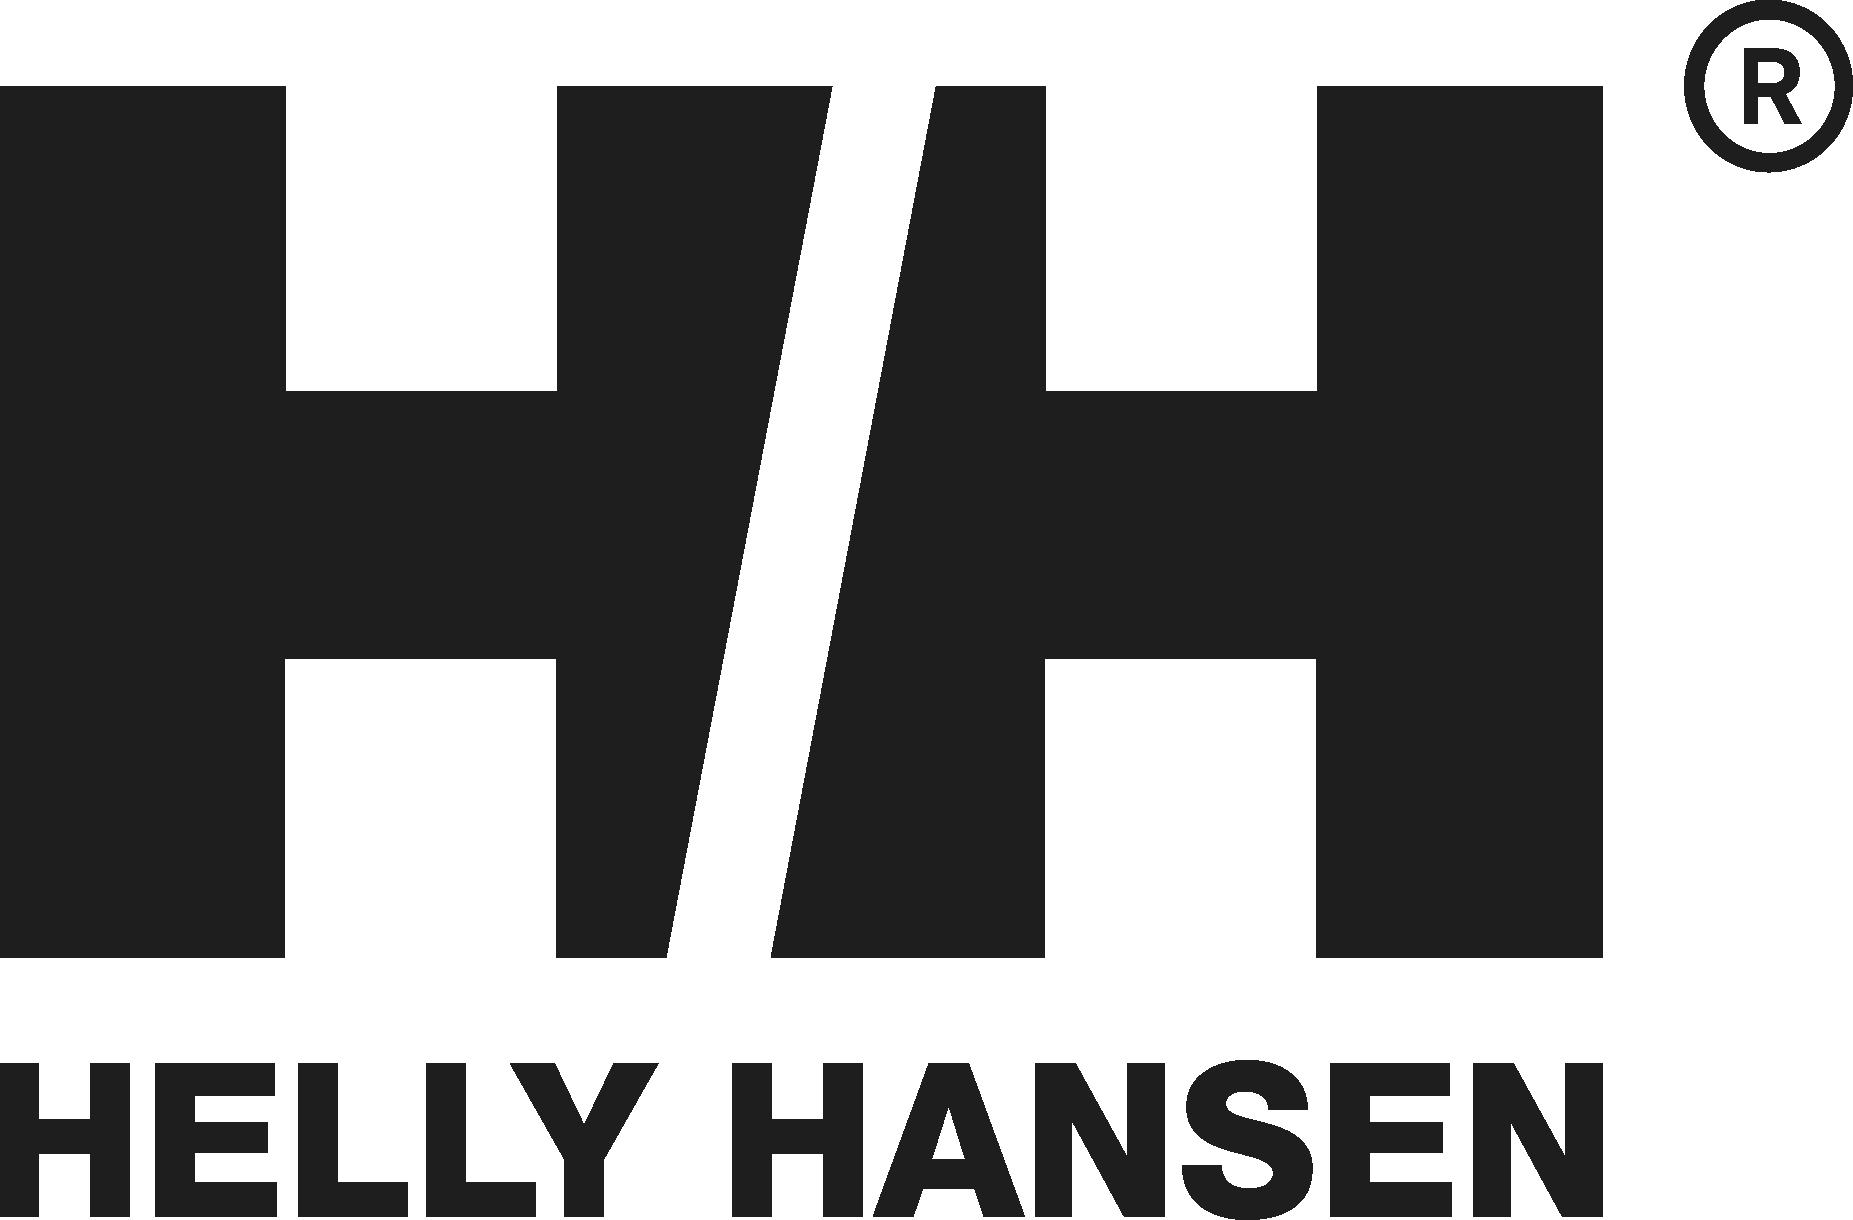 hh-logo-helly-hansen.png